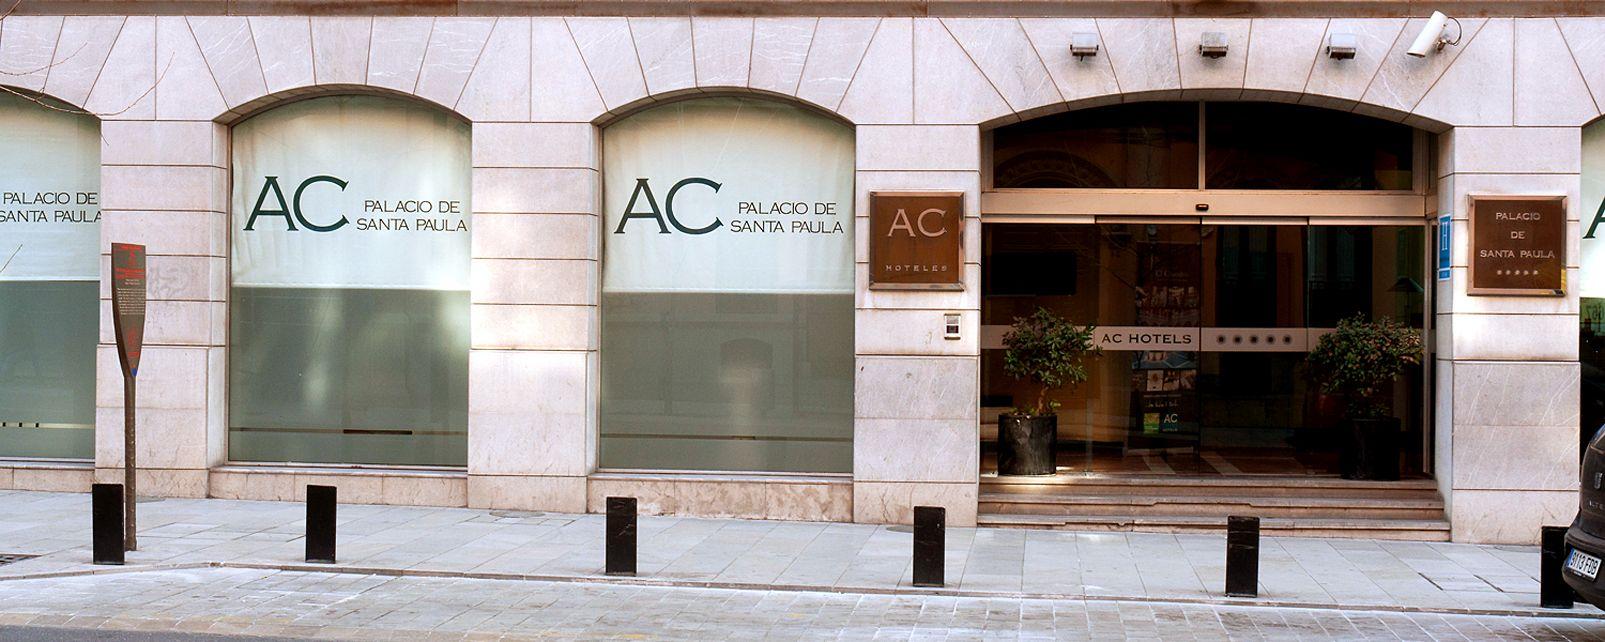 Hôtel AC Palacio de Santa Paula